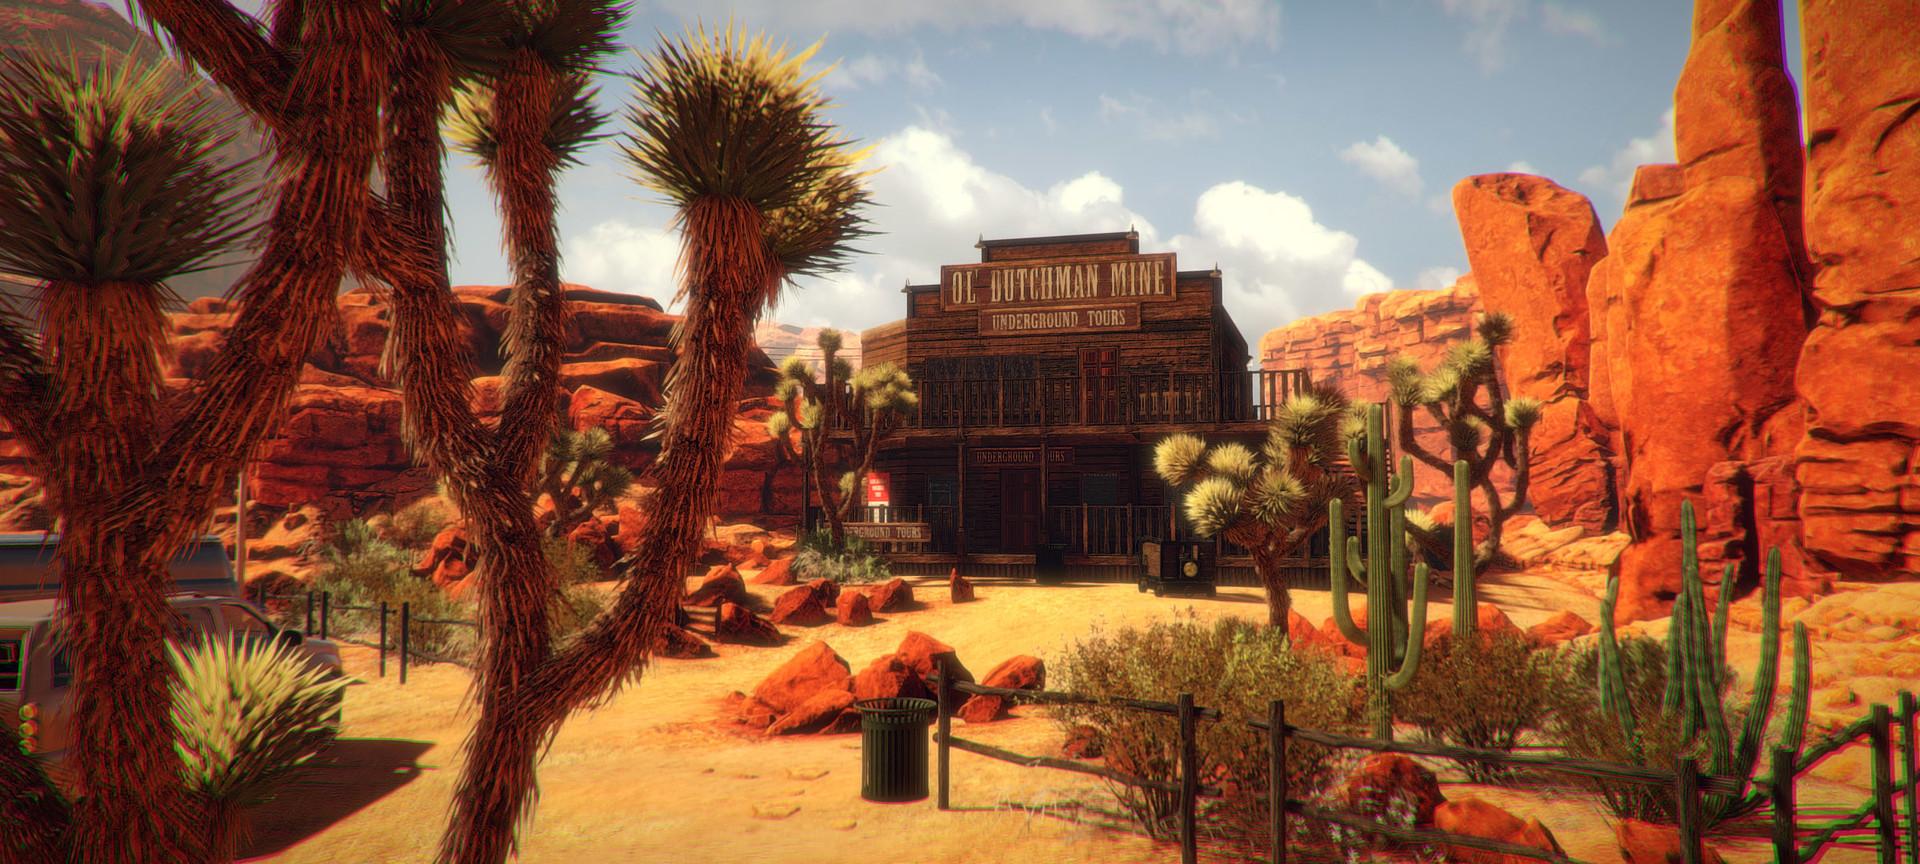 Arizona Sunshine Screenshot